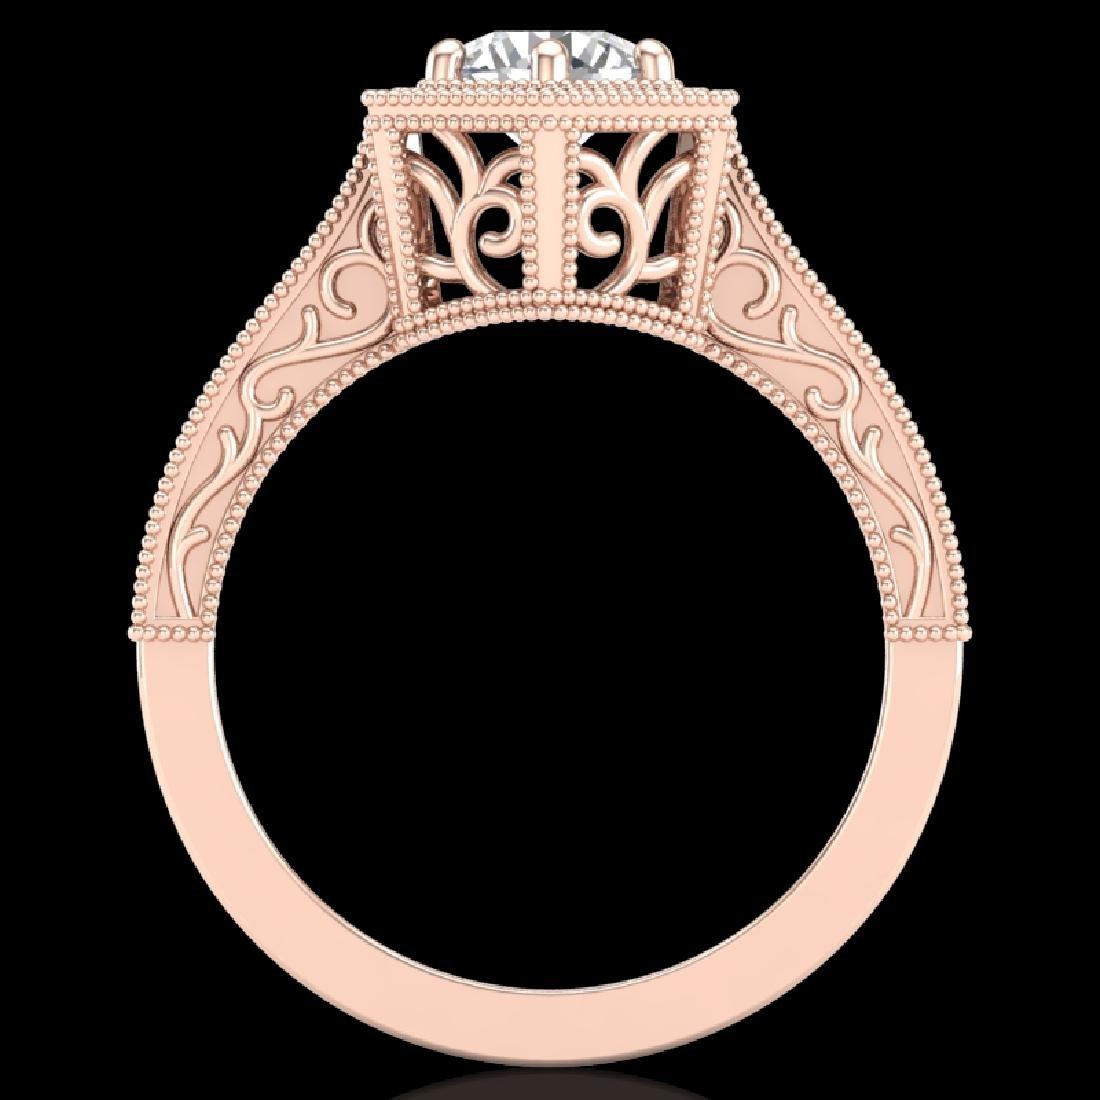 0.77 CTW VS/SI Diamond Solitaire Art Deco Ring 18K Rose